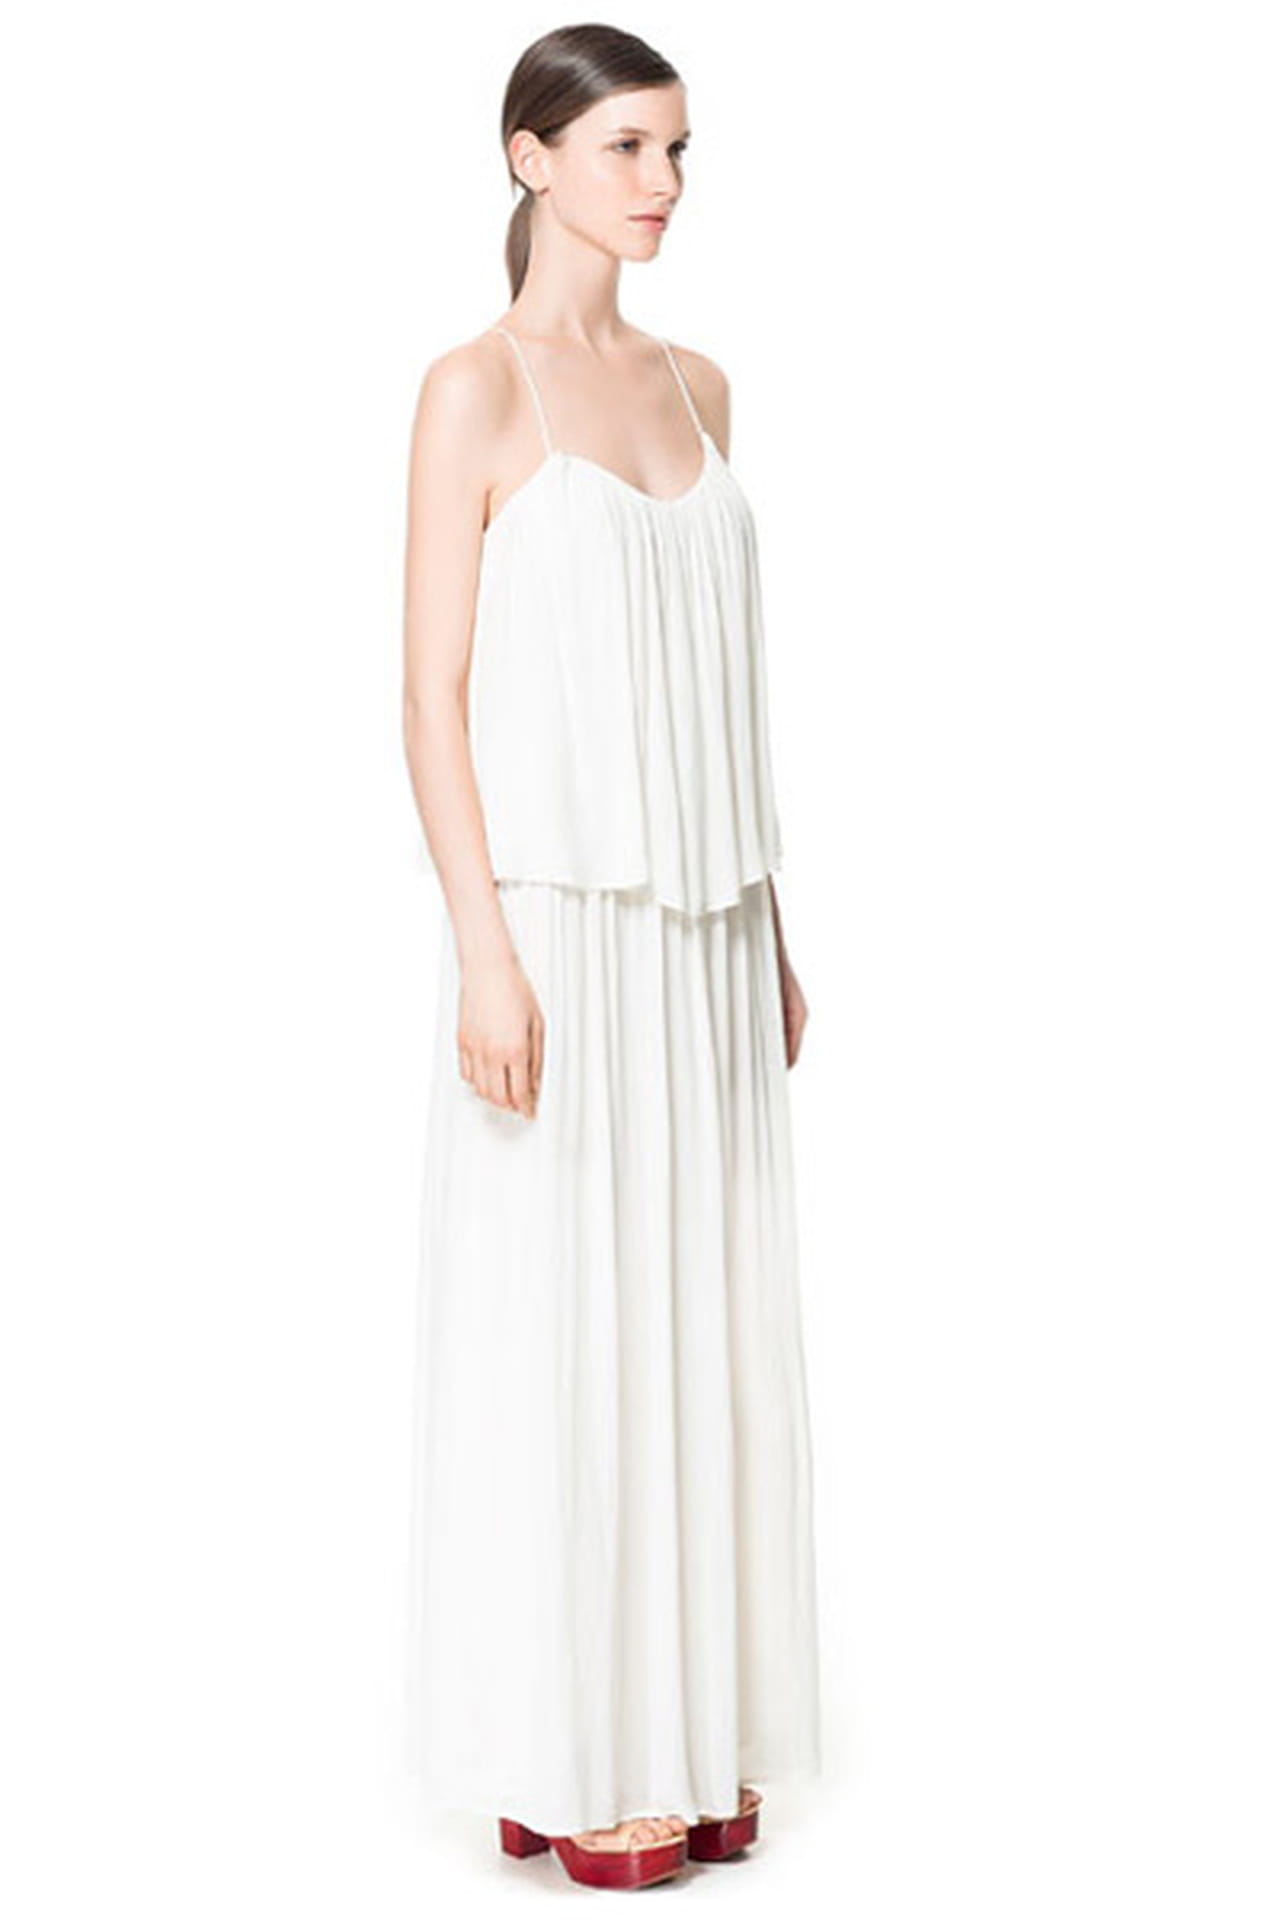 0a31d7754c732 فستان صيفي طويل من Zara. فستان أبيض من Zara. من موضة صيف 2013